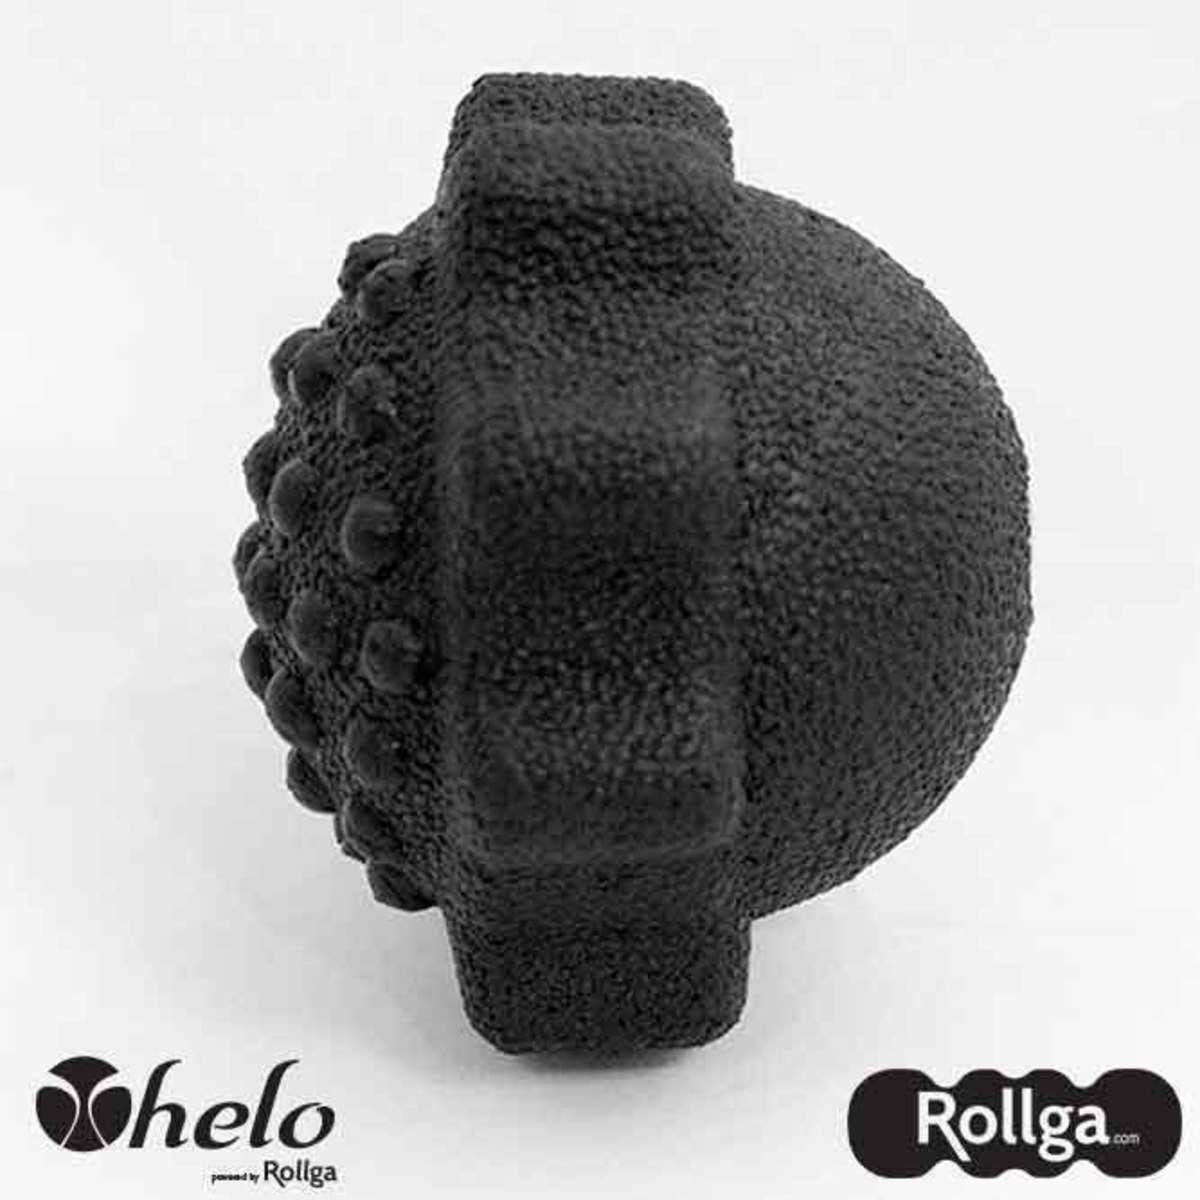 Rollga Massage Ball